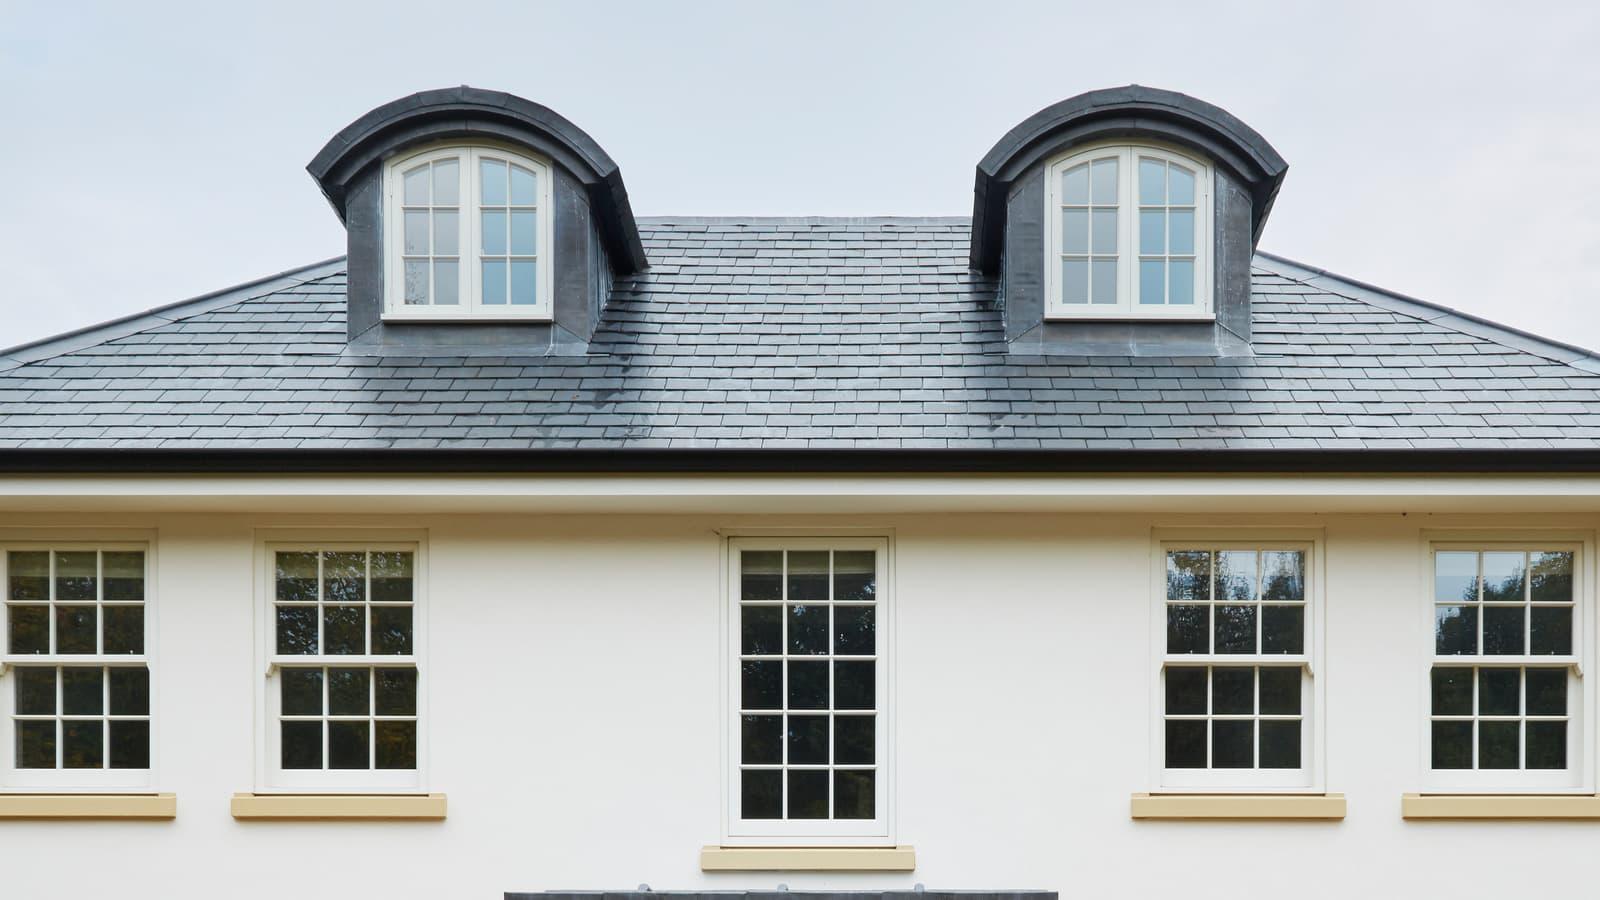 Dormer windows in roof of property